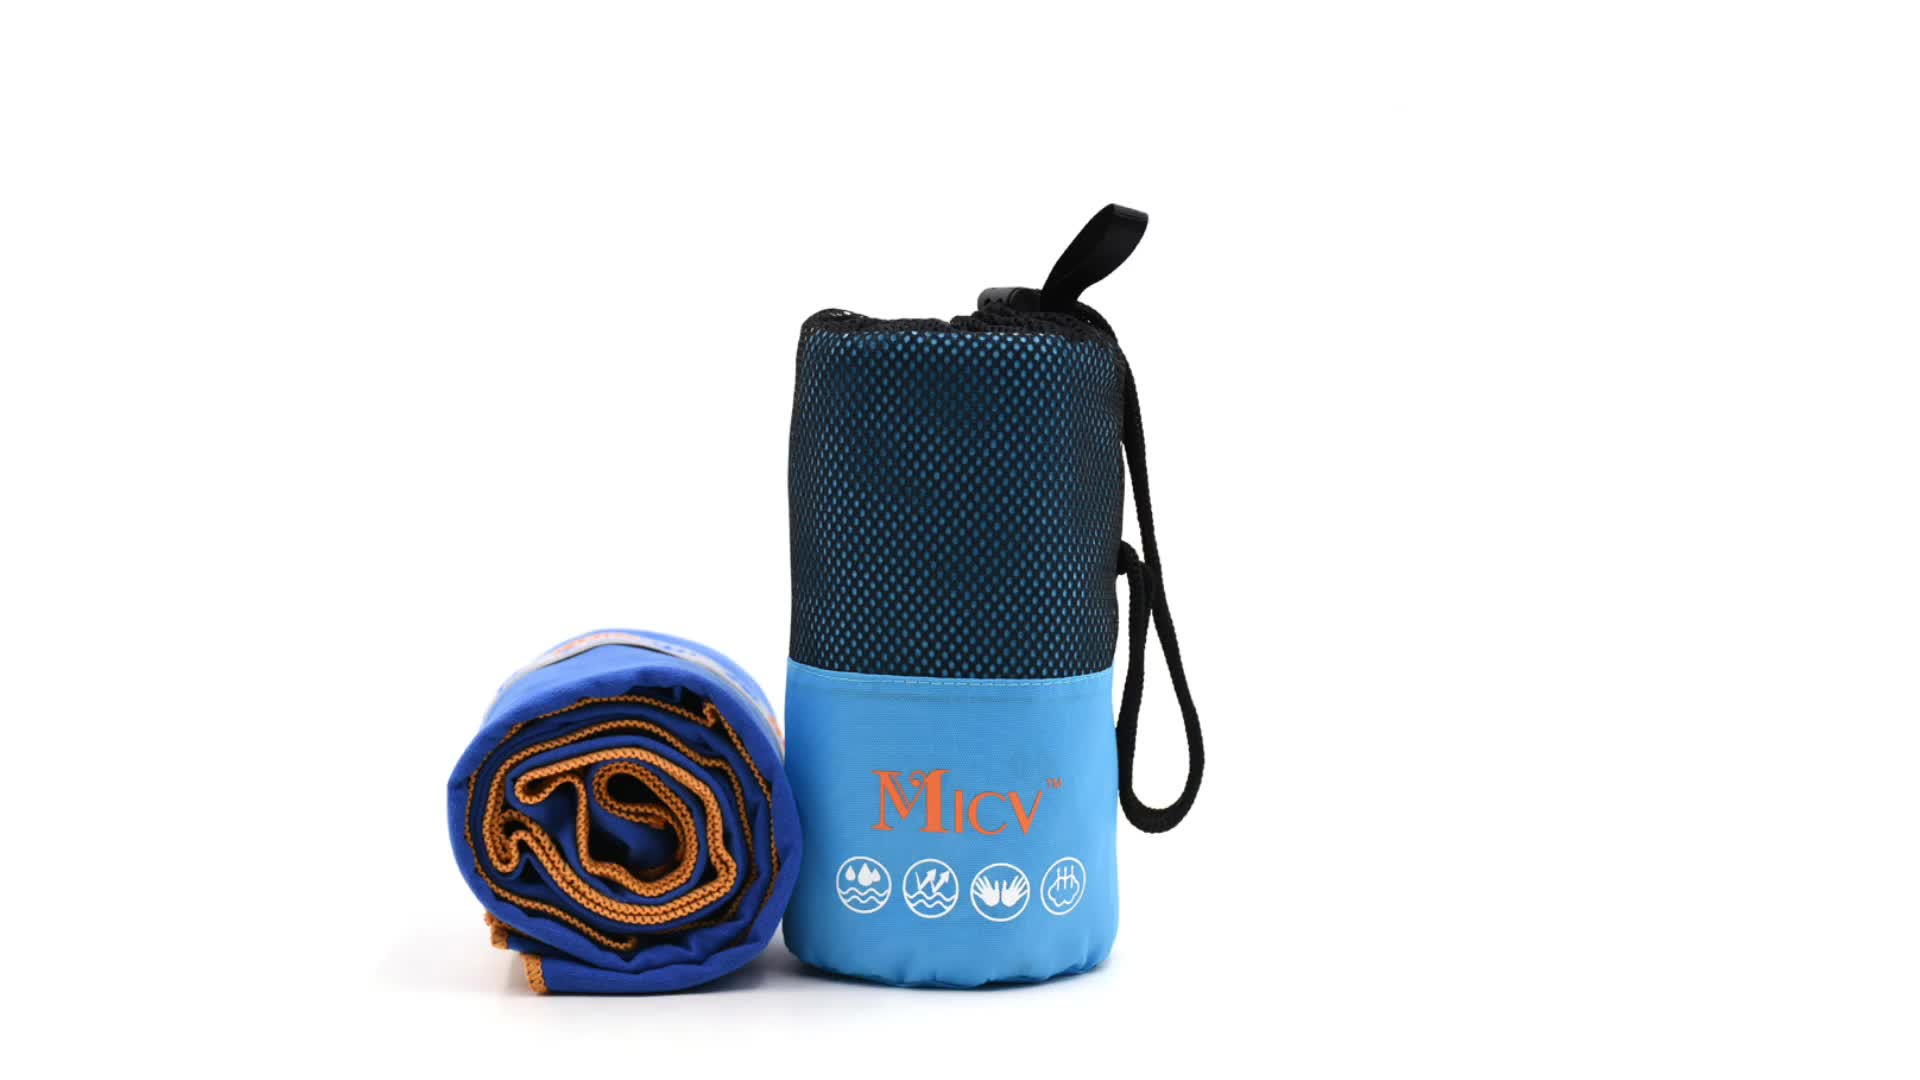 Toptan premium mikrofiber yoga mat havlu seti özel etiket ekli